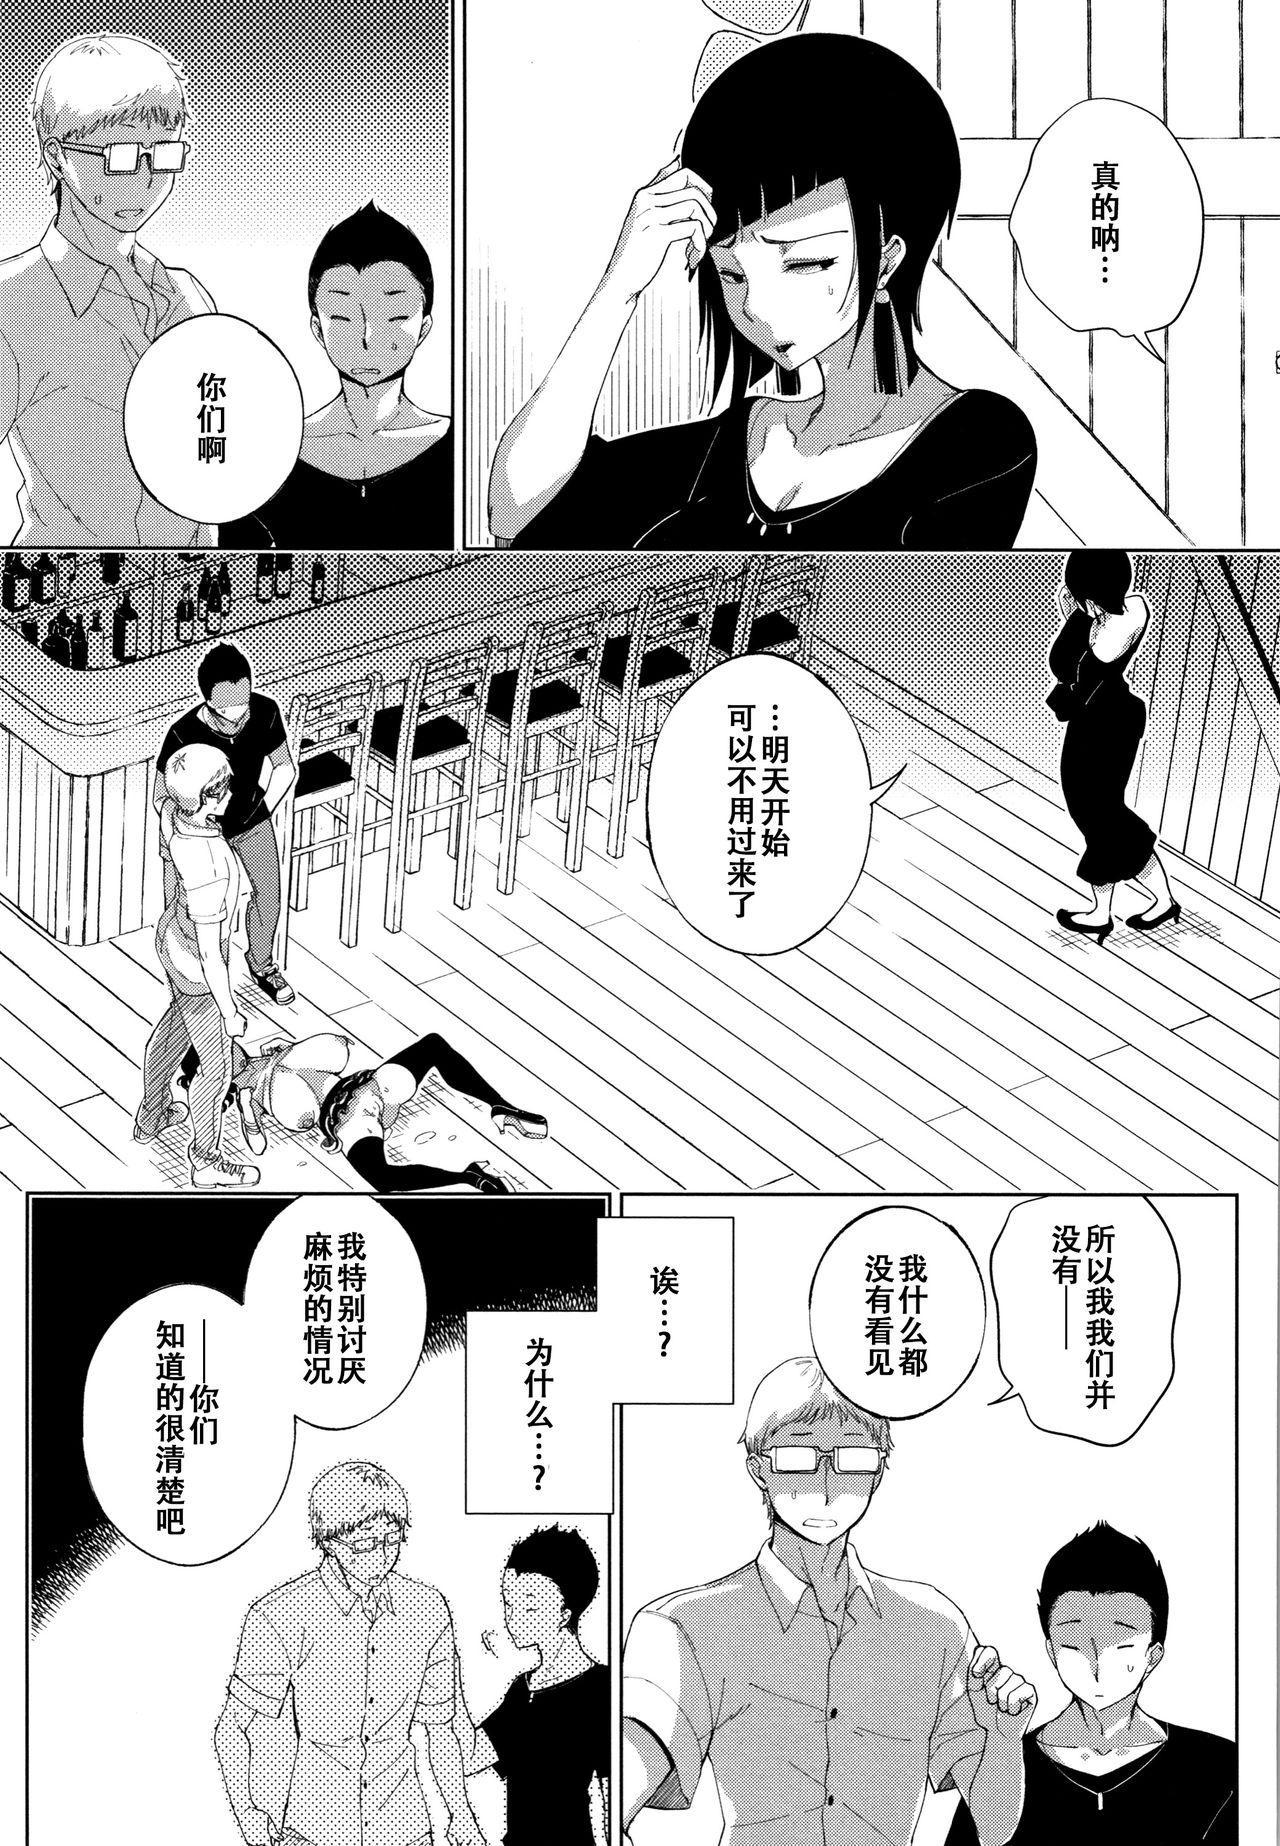 [Achumuchi] Saijaku Gal wa Ikizurai! - The weakest pussy is hard to go.ch.1-3 [Chinese] [战栗的玻璃棒汉化] [Ongoing] 51